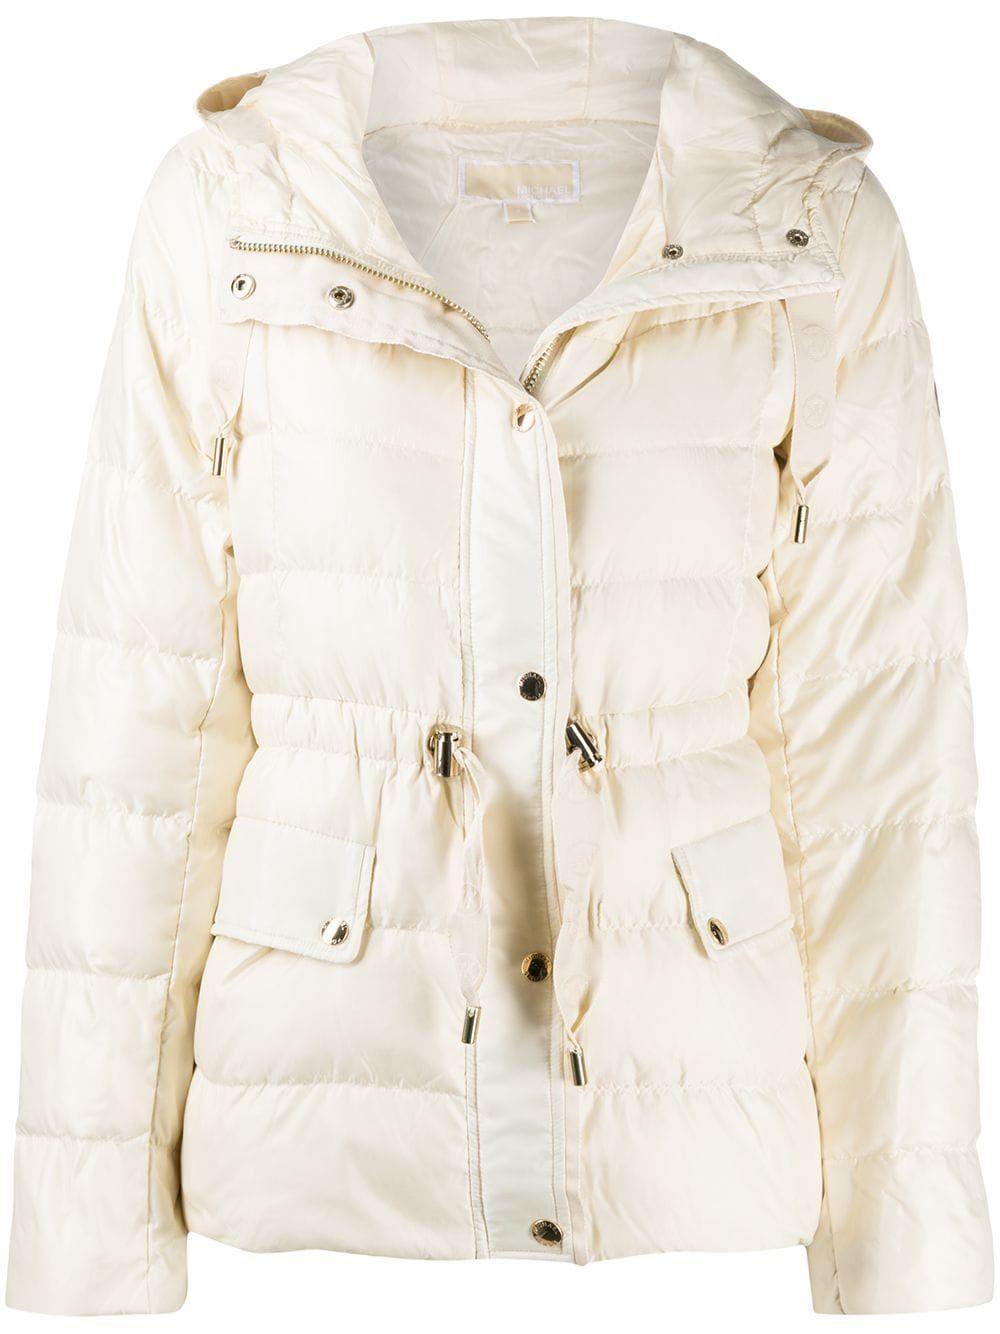 Michael Michael Kors Hooded Puffer Jacket Farfetch Michael Kors Puffer Jackets Michael Kors Jackets [ 1334 x 1000 Pixel ]